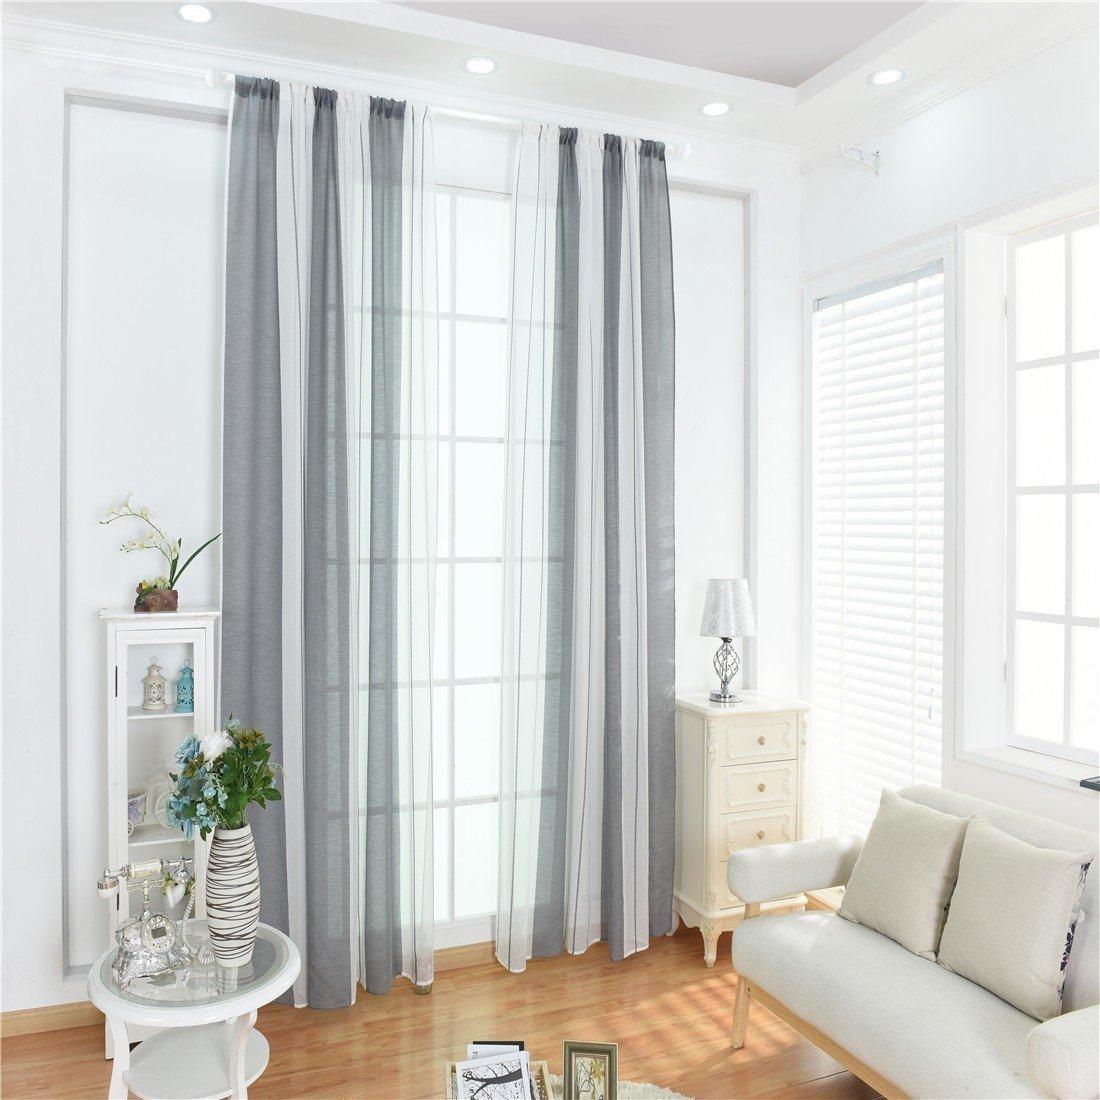 Winwinus Stripes Sheer Curtain Panel Eyelet Top Drapes Window Covering for Doors, (Single Panel,39Wx79L) Grey White Stripe 3979inch